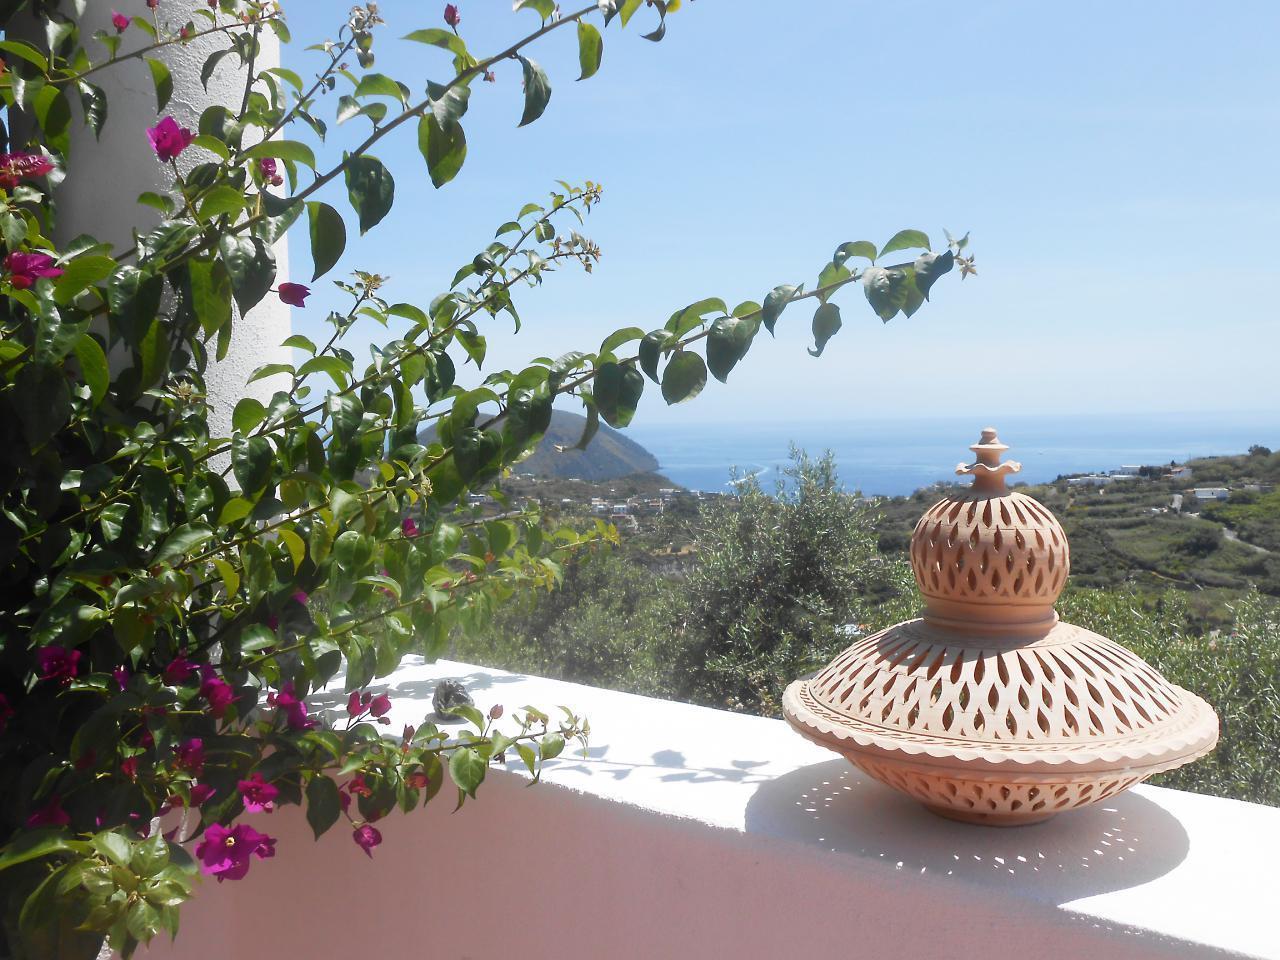 Maison de vacances Ferienhaushälfte Oleandro auf sizilianischer Insel mit atemberaubenden Meeres-Rundblick (2045159), Lipari, Lipari, Sicile, Italie, image 5